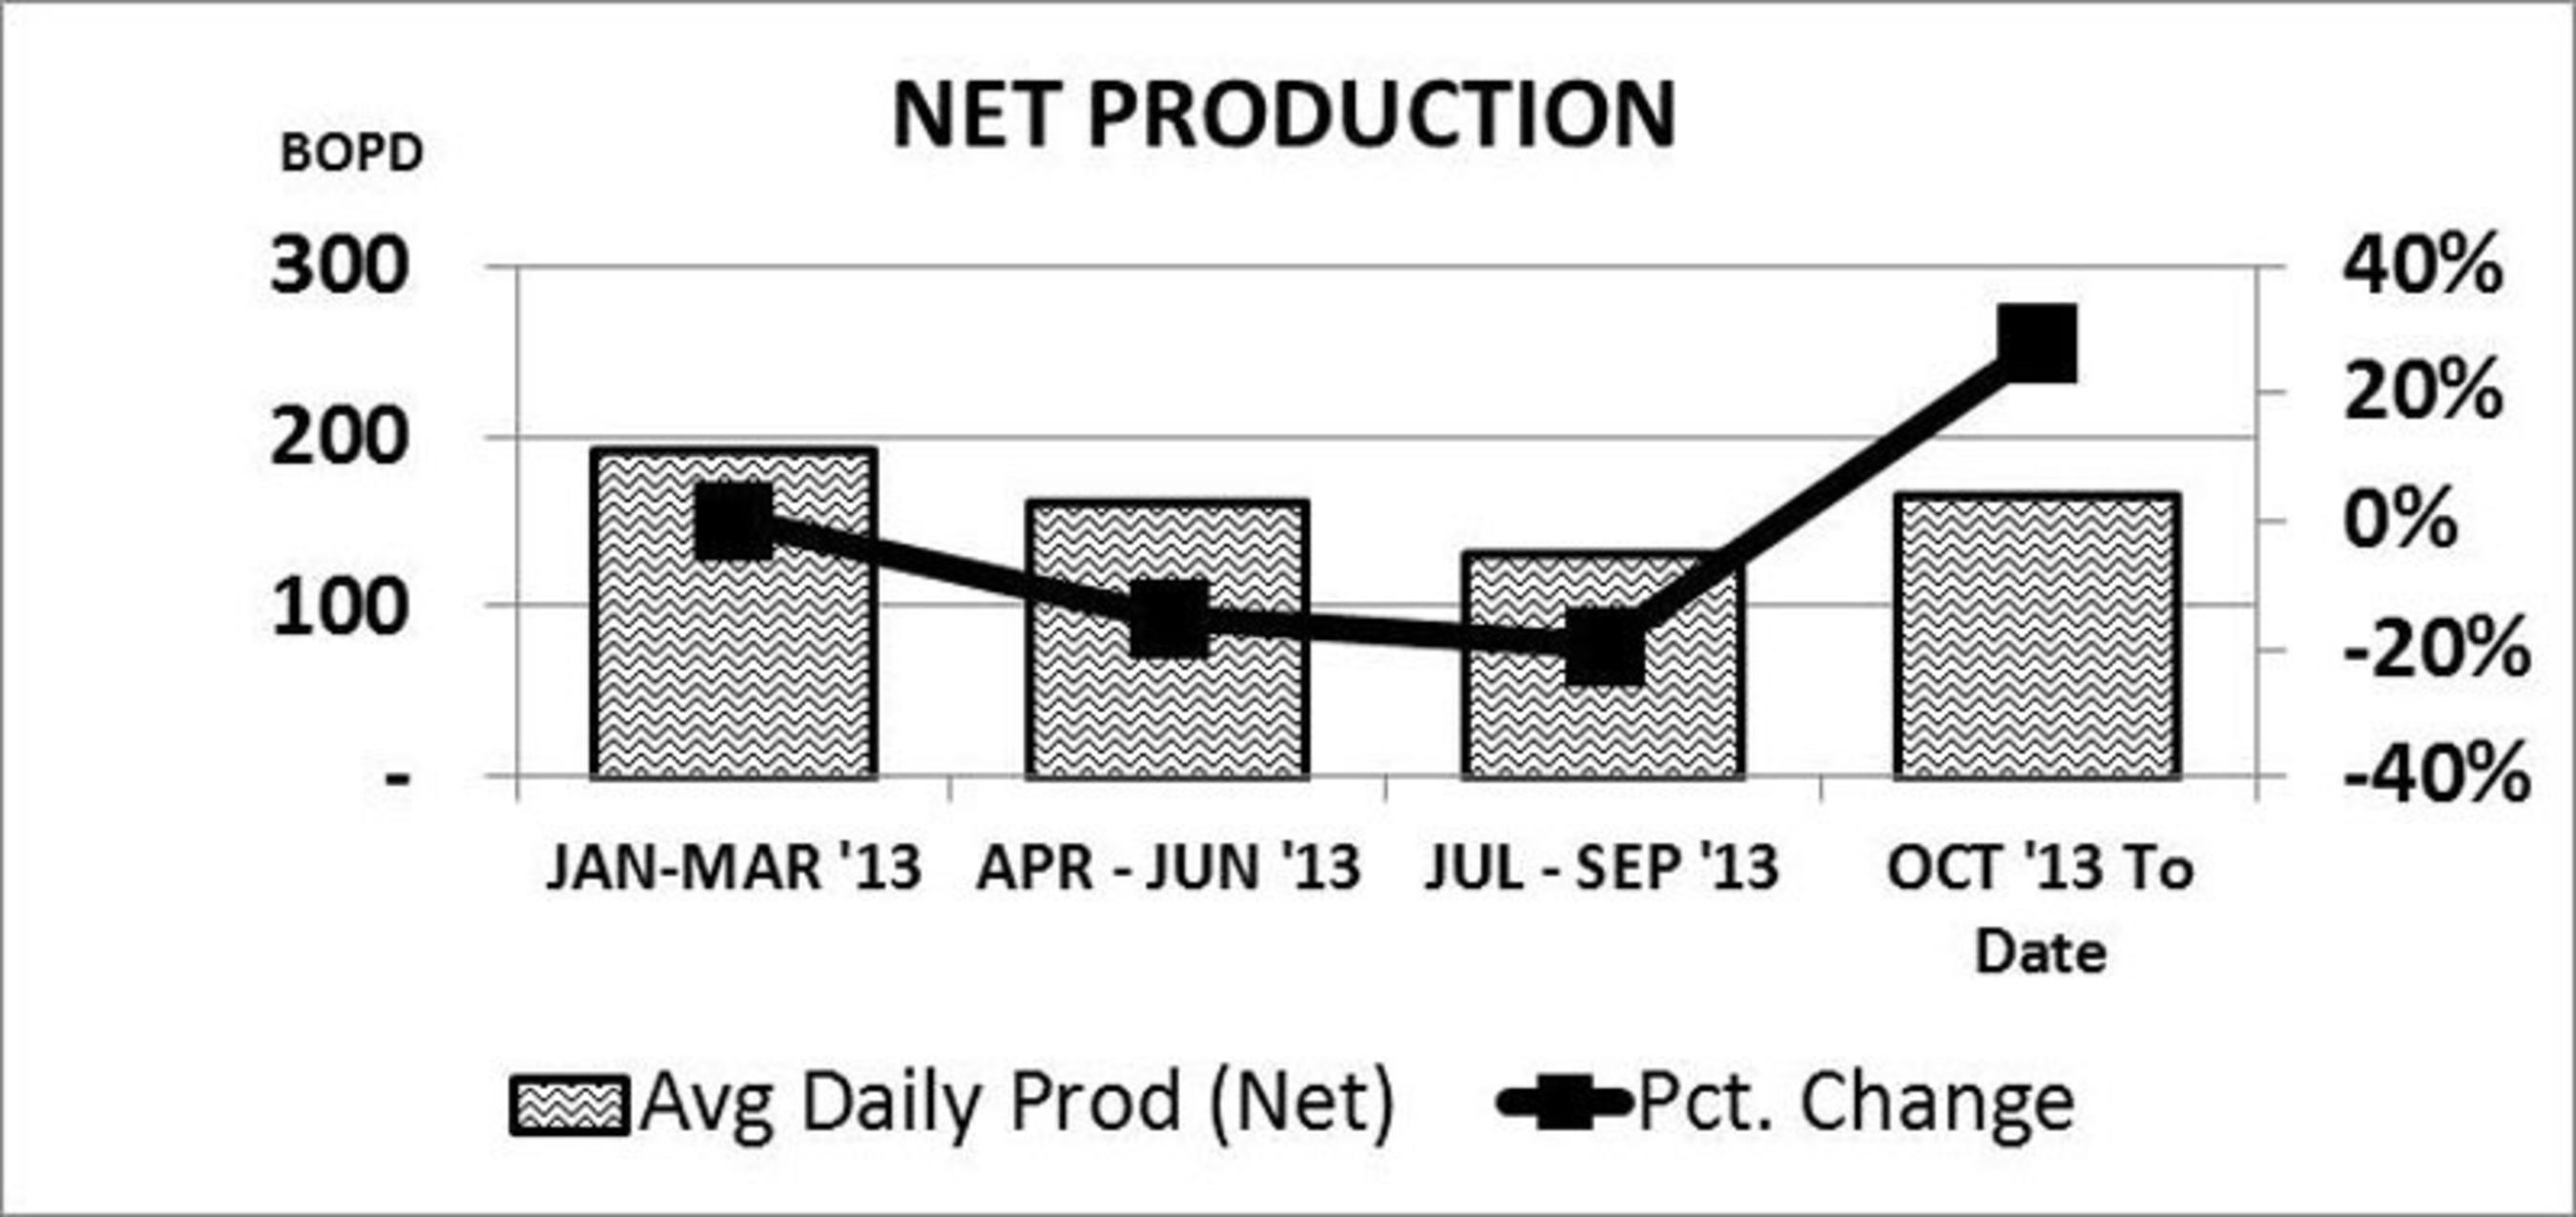 LEI net production, Jan to present 2013. (PRNewsFoto/Lucas Energy, Inc.)